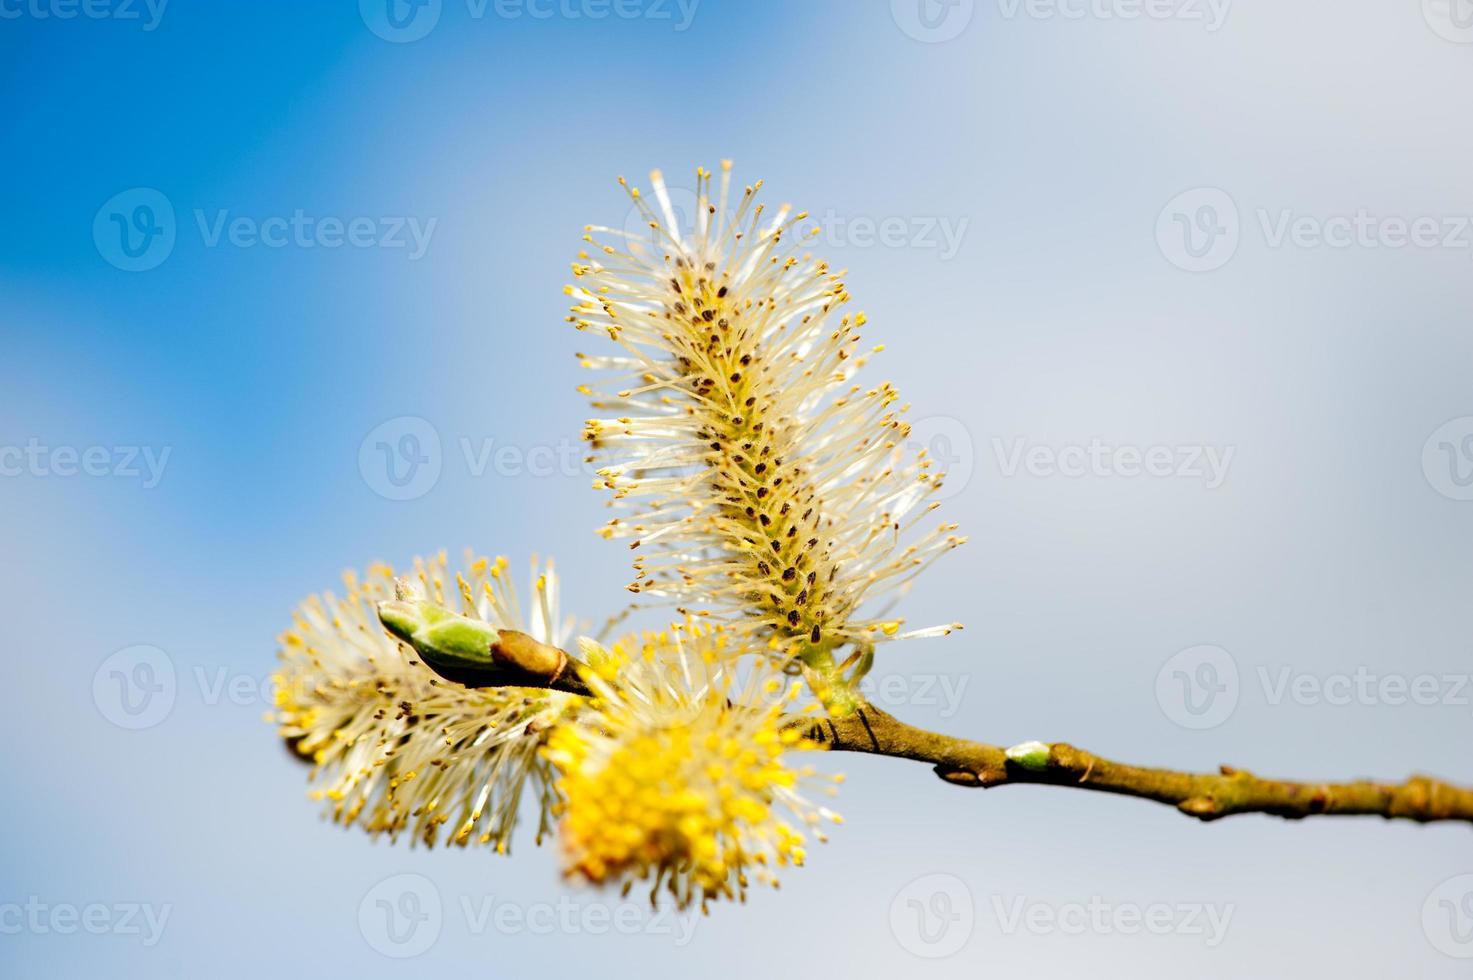 rami di salice figa soleggiata foto